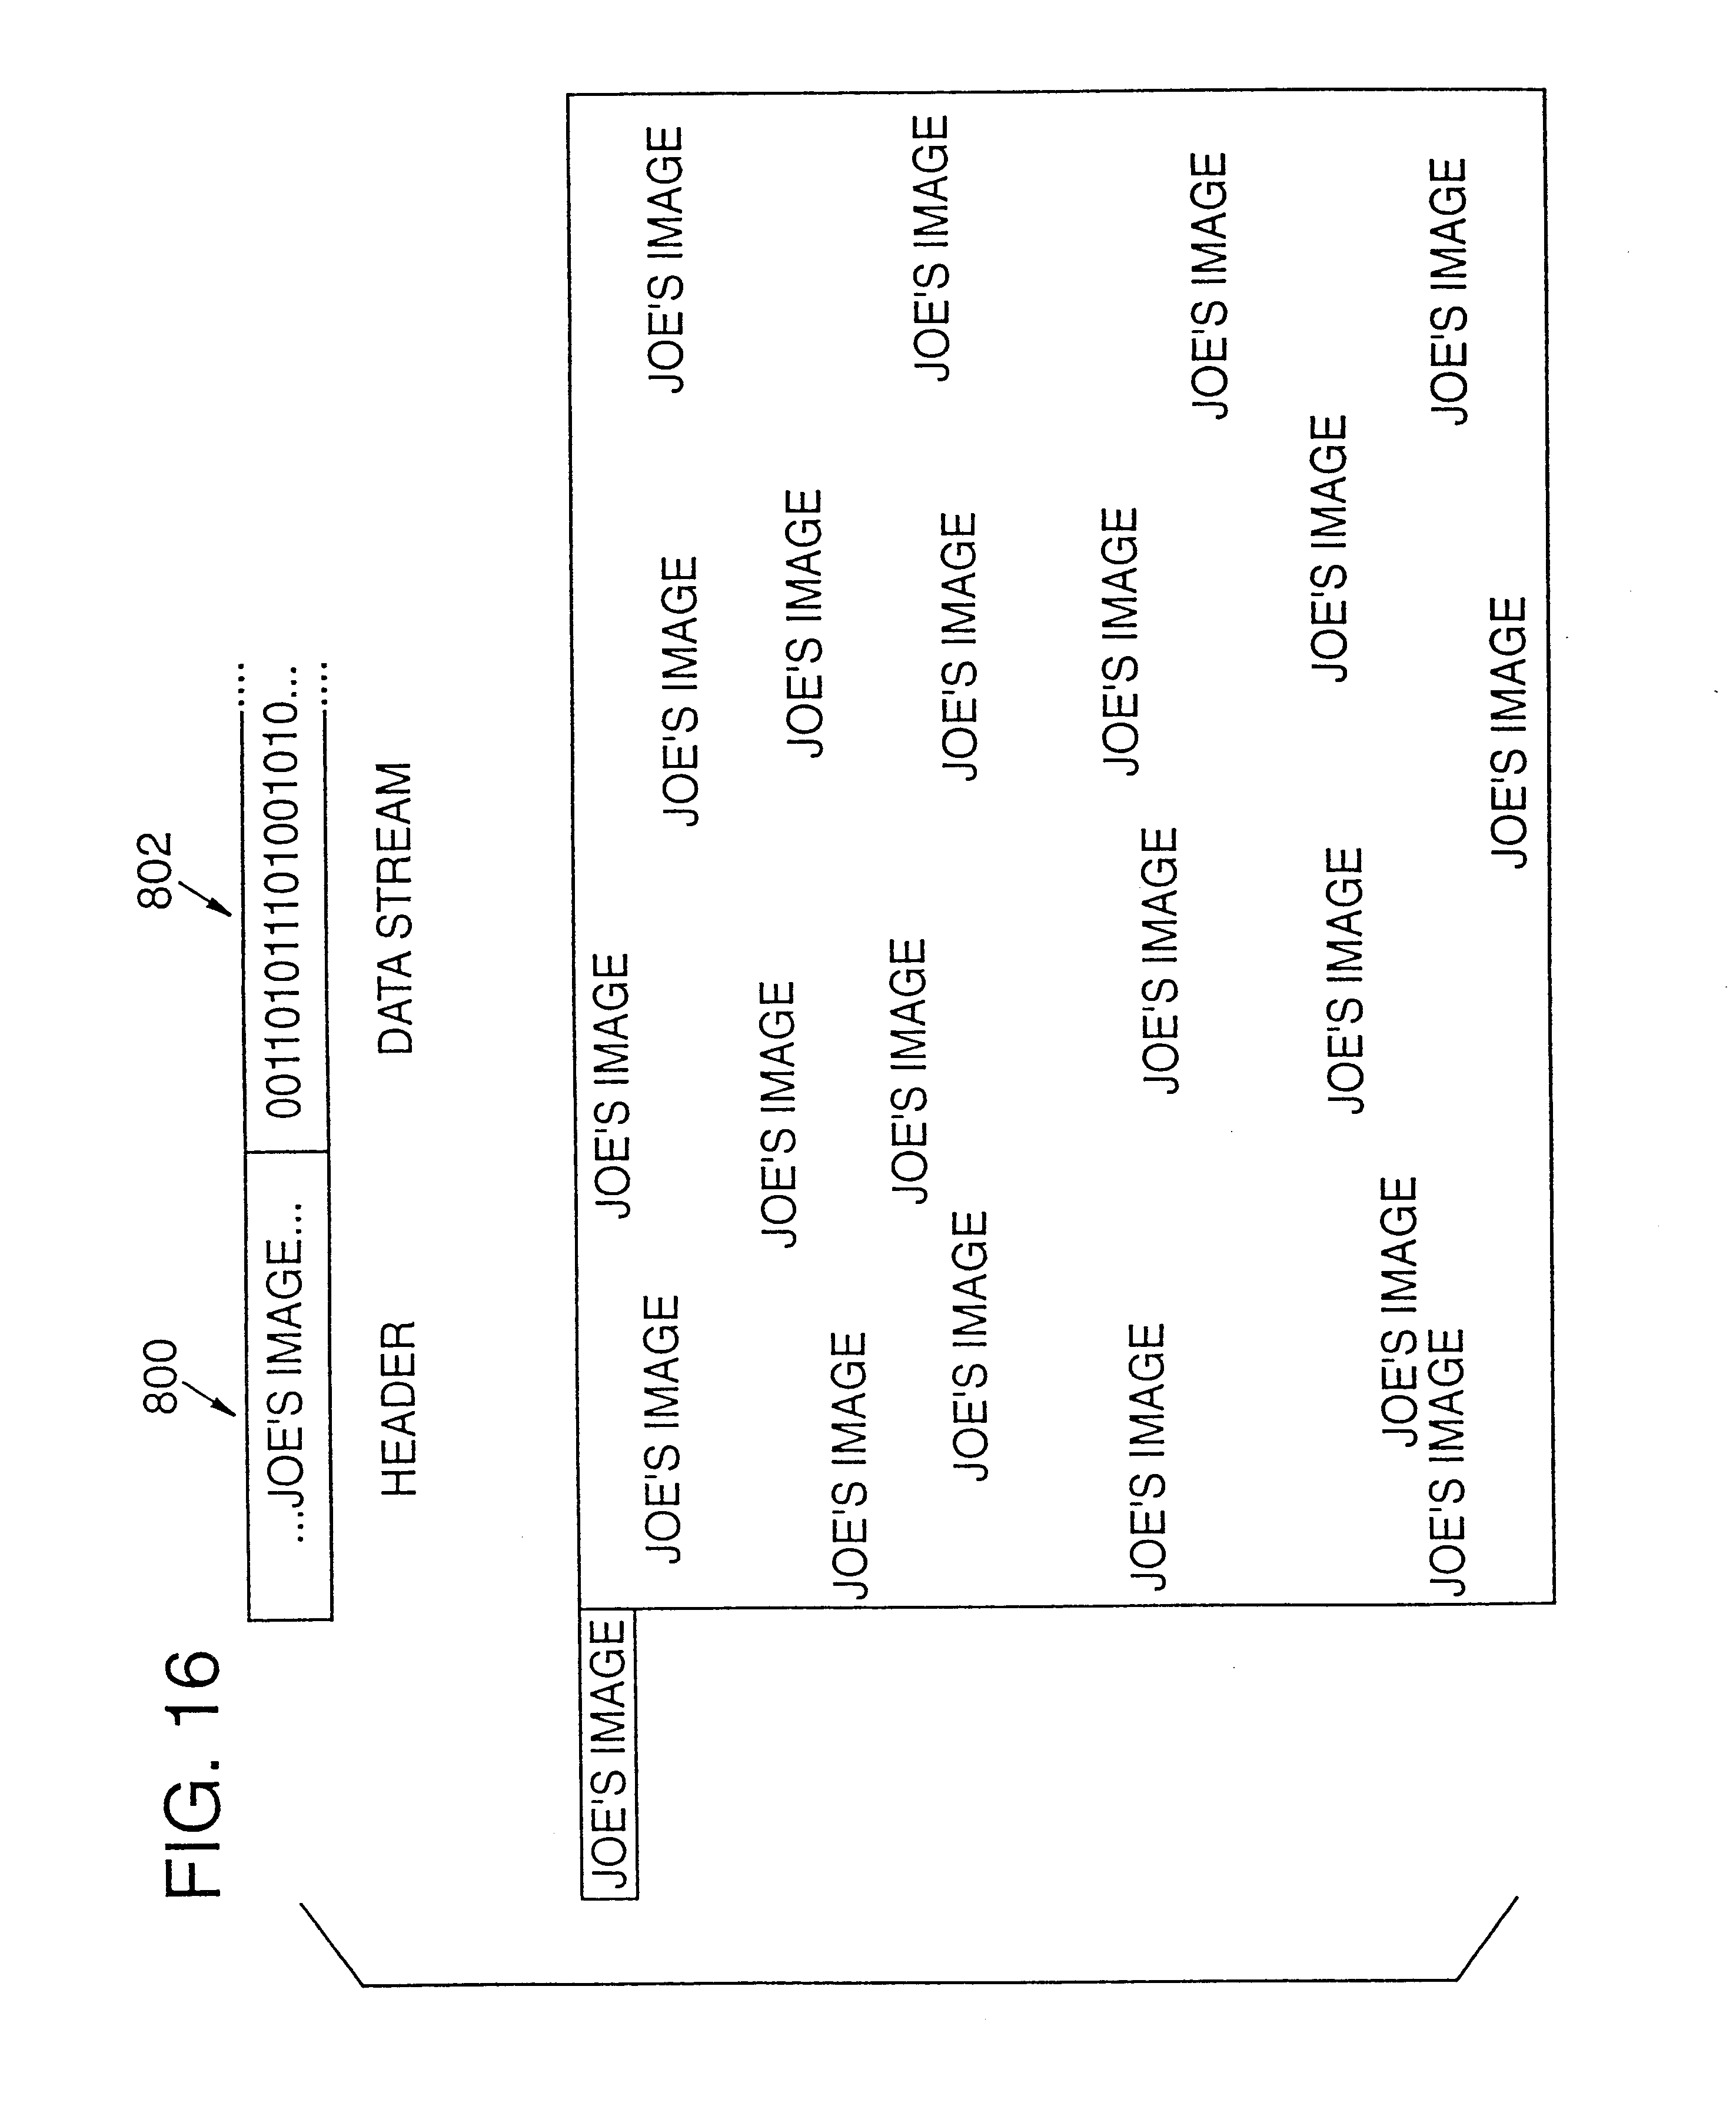 Patent US 6,675,146 B2